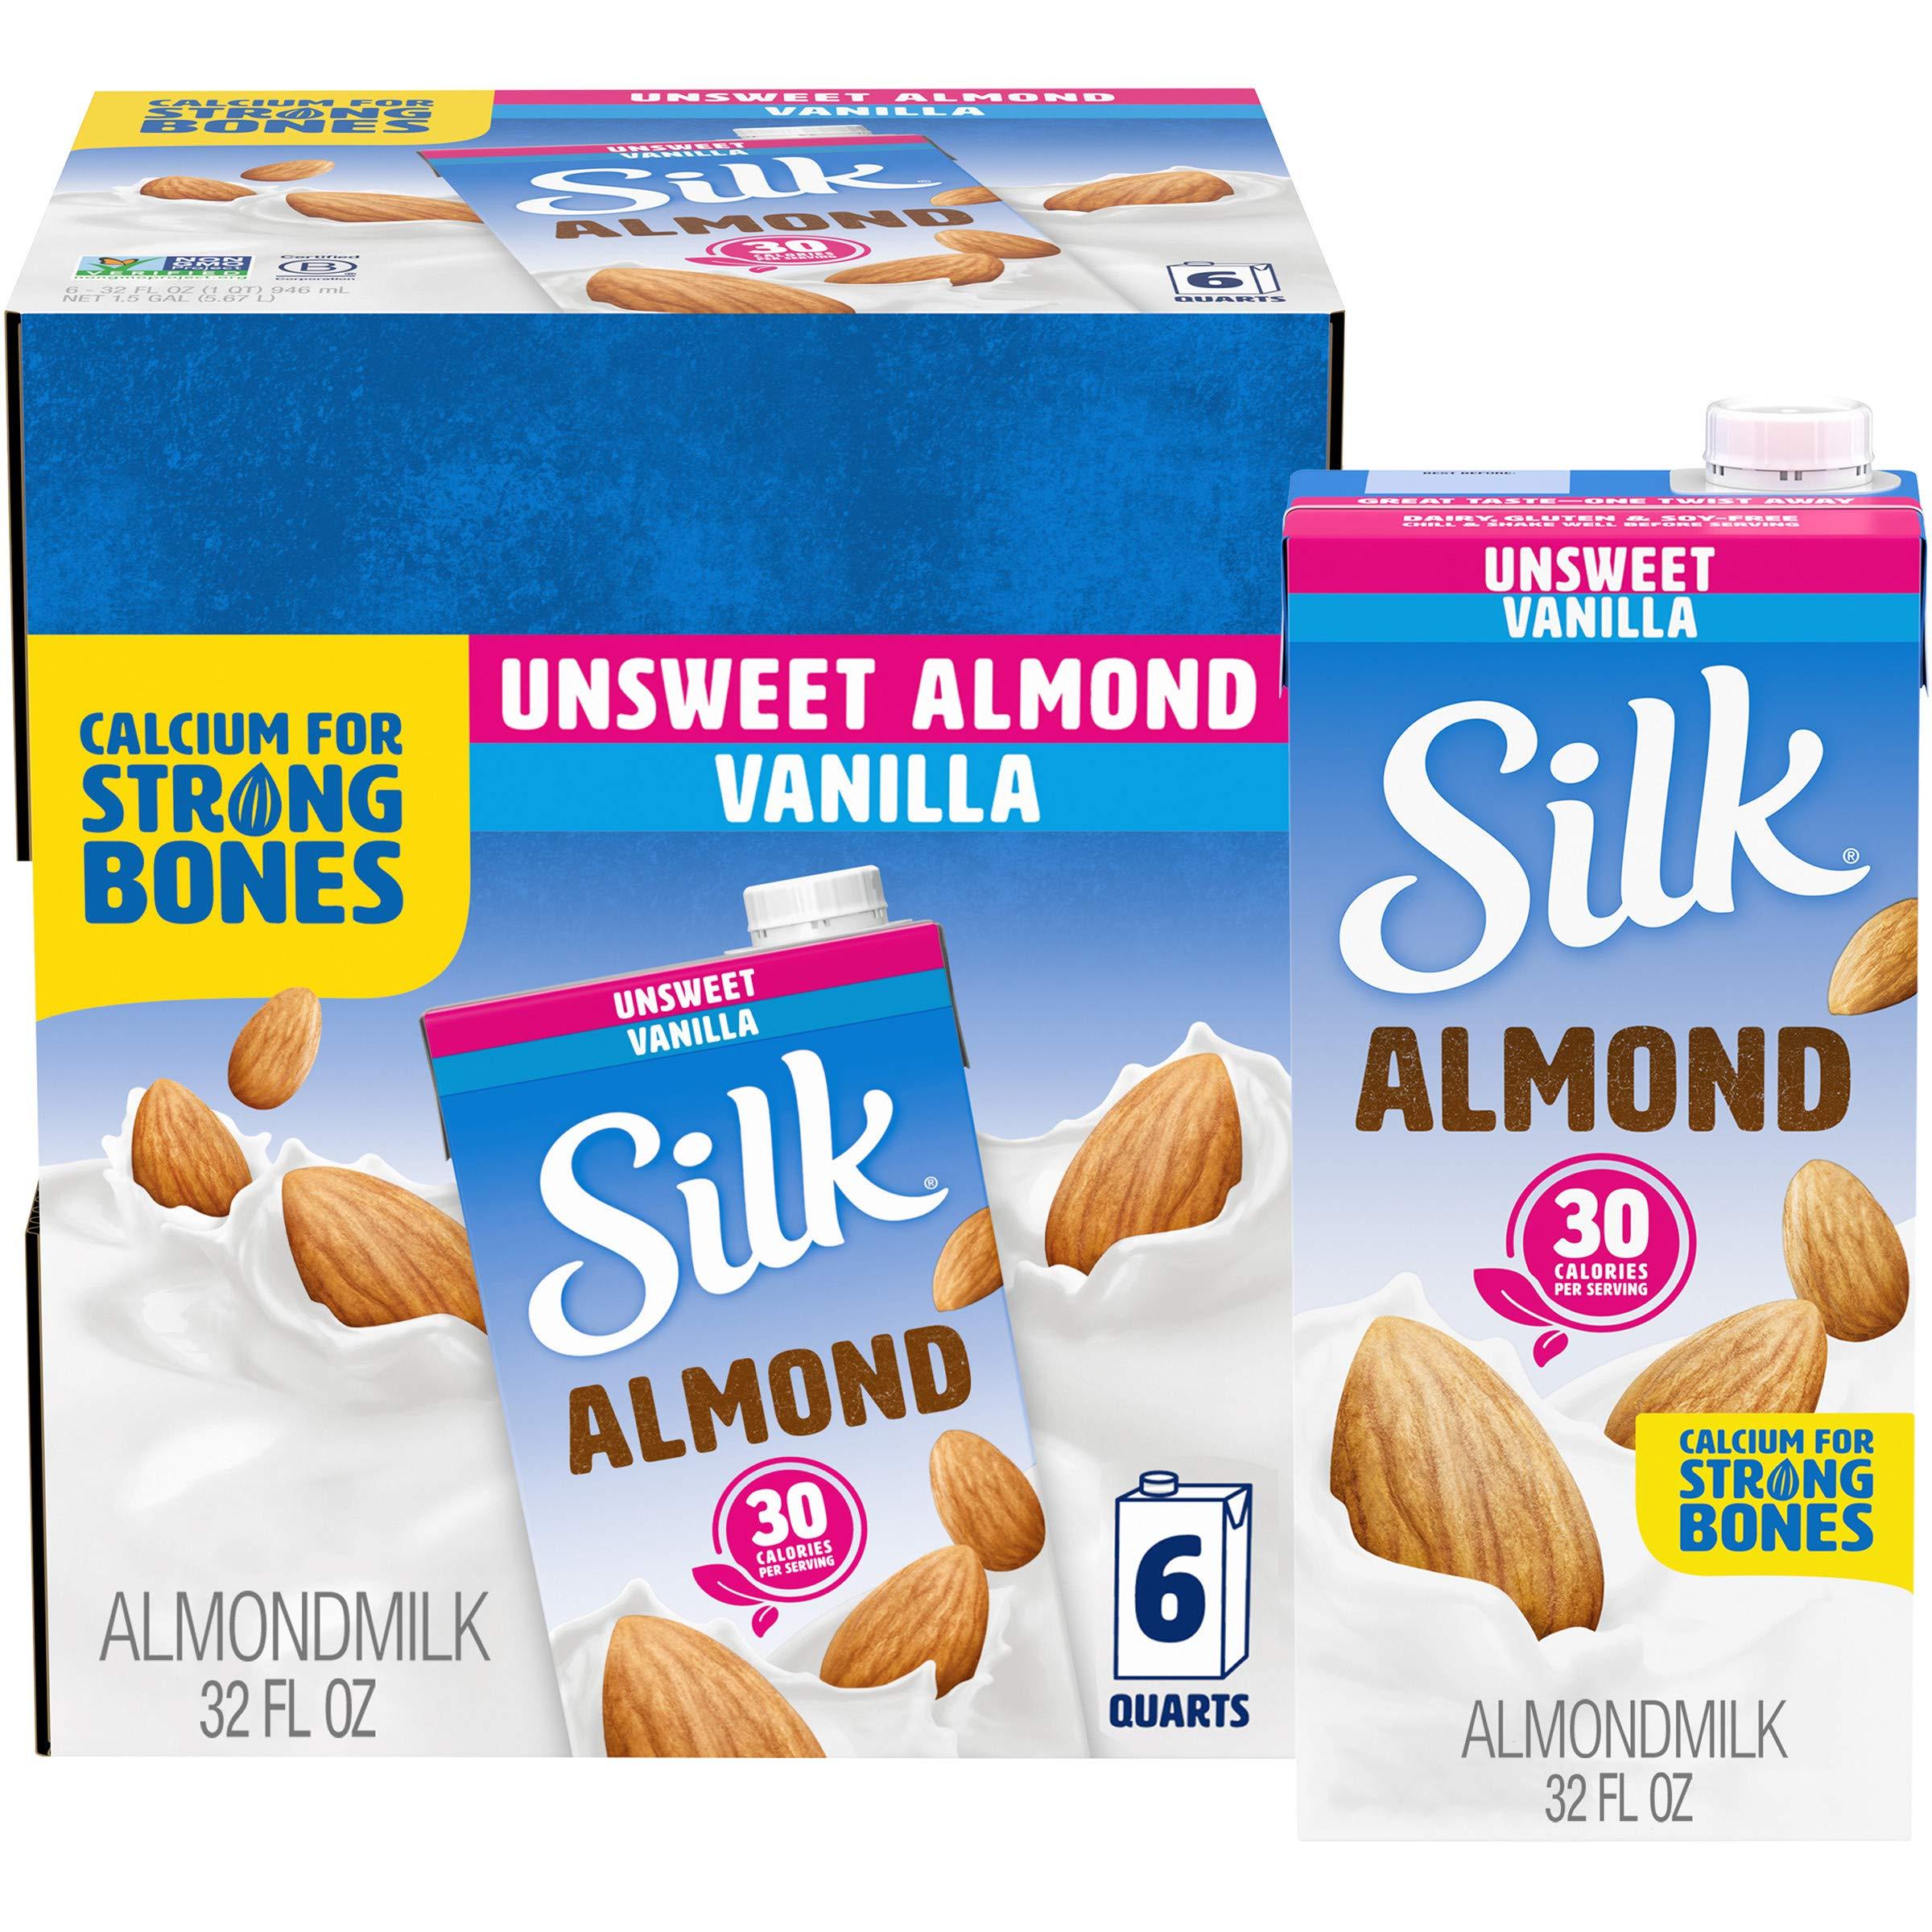 Silk Almond Milk, Unsweetened Vanilla, 32 Fluid Ounce (Pack of 6), Vanilla Flavored Non-Dairy Almond Milk, Dairy-free Milk